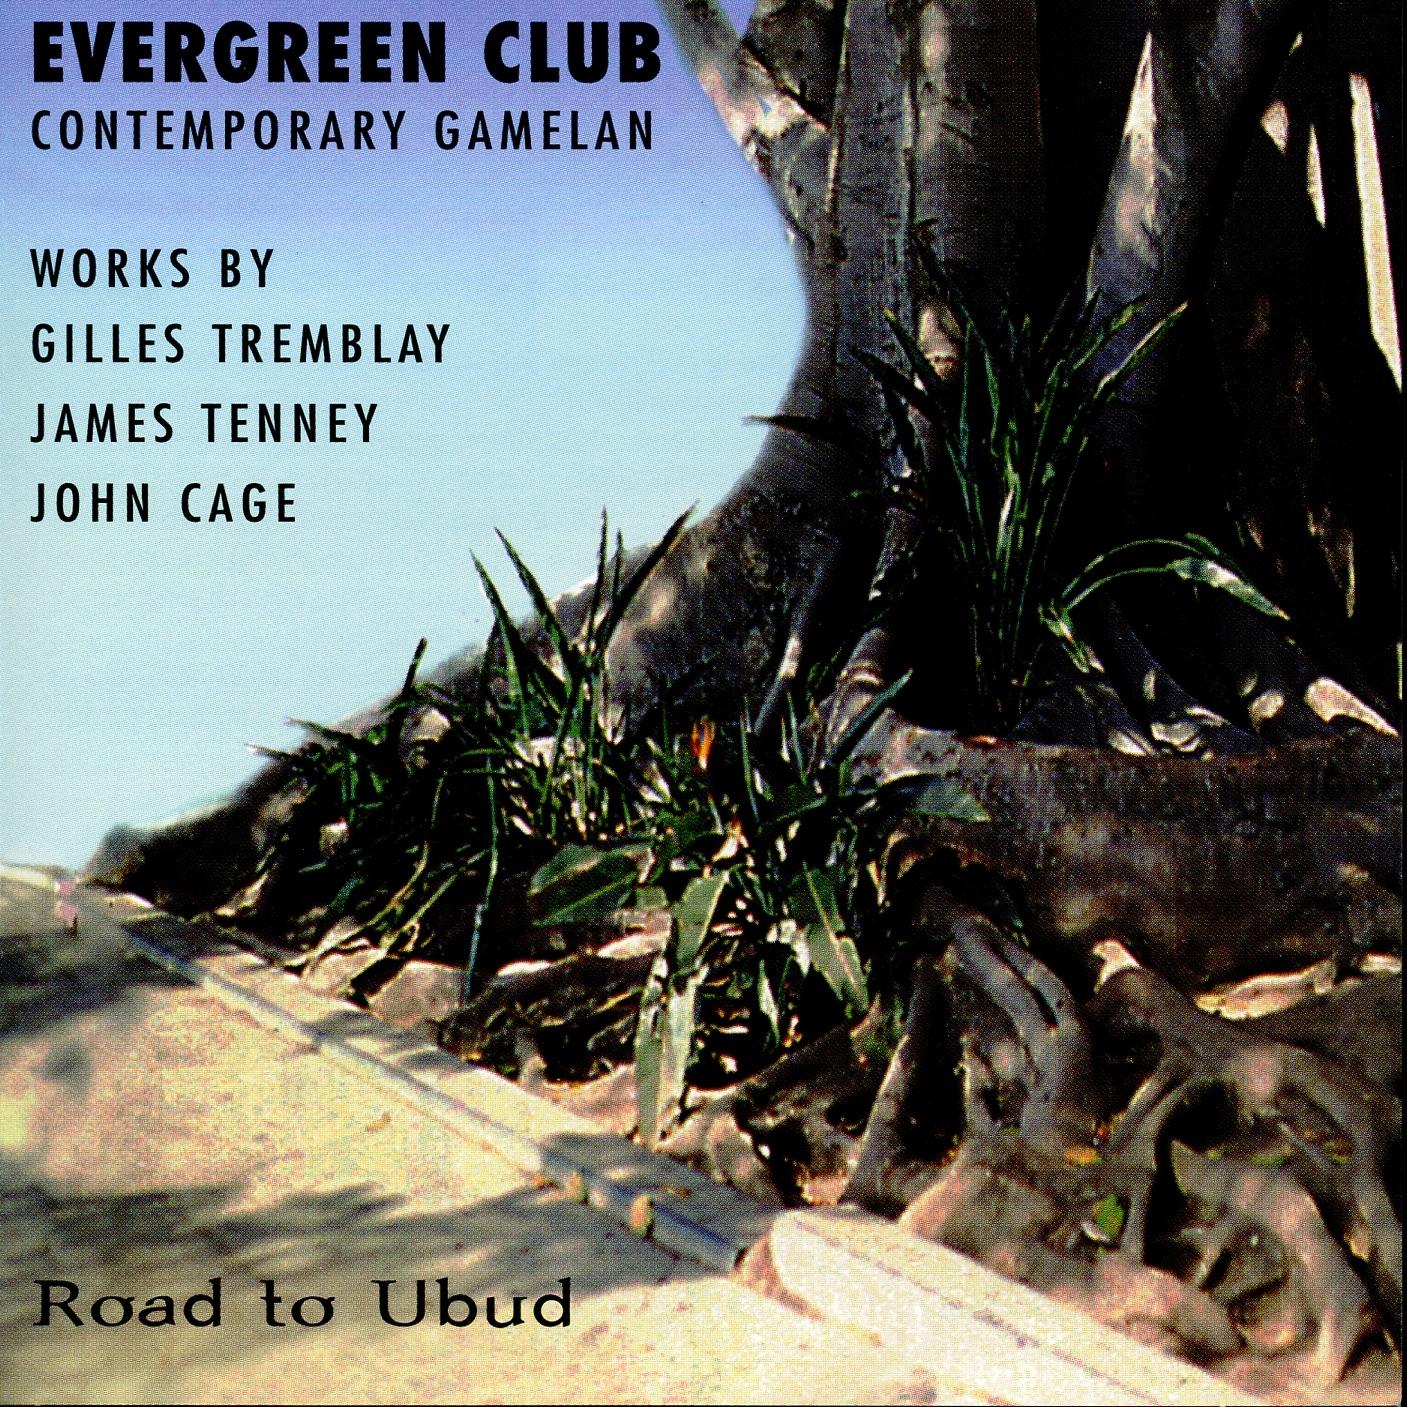 Tenney: Road to Ubud - Cage: Haikai - Tremblay: L'arbre de Borobudur